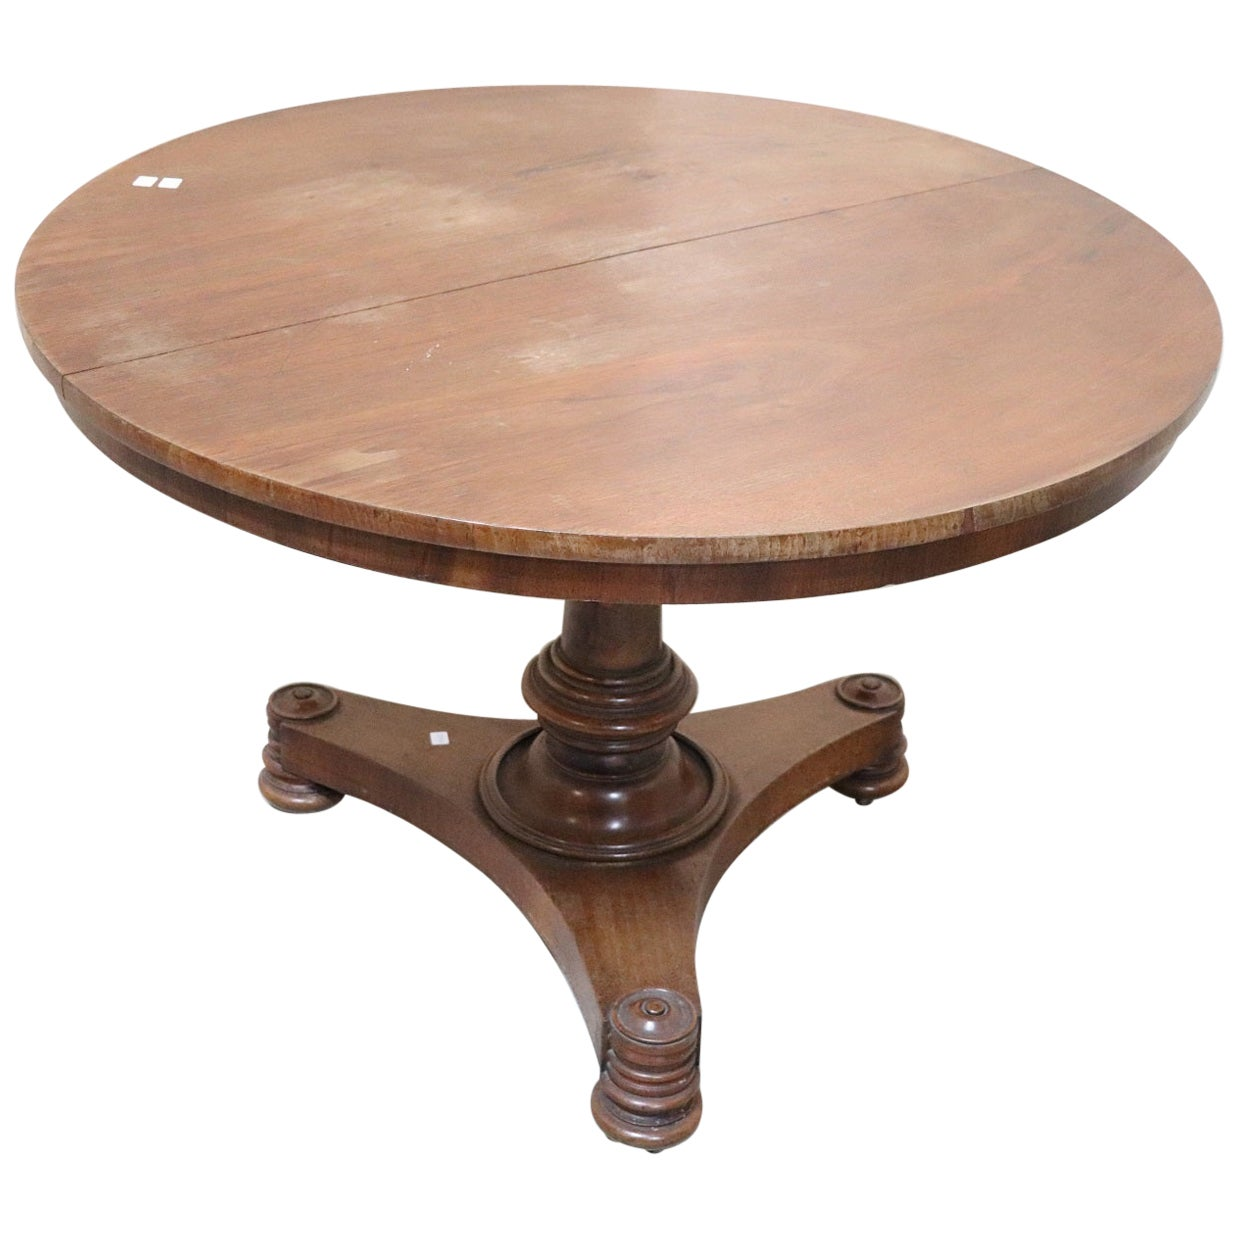 19th Century Italian Charles X Walnut Round Center Table